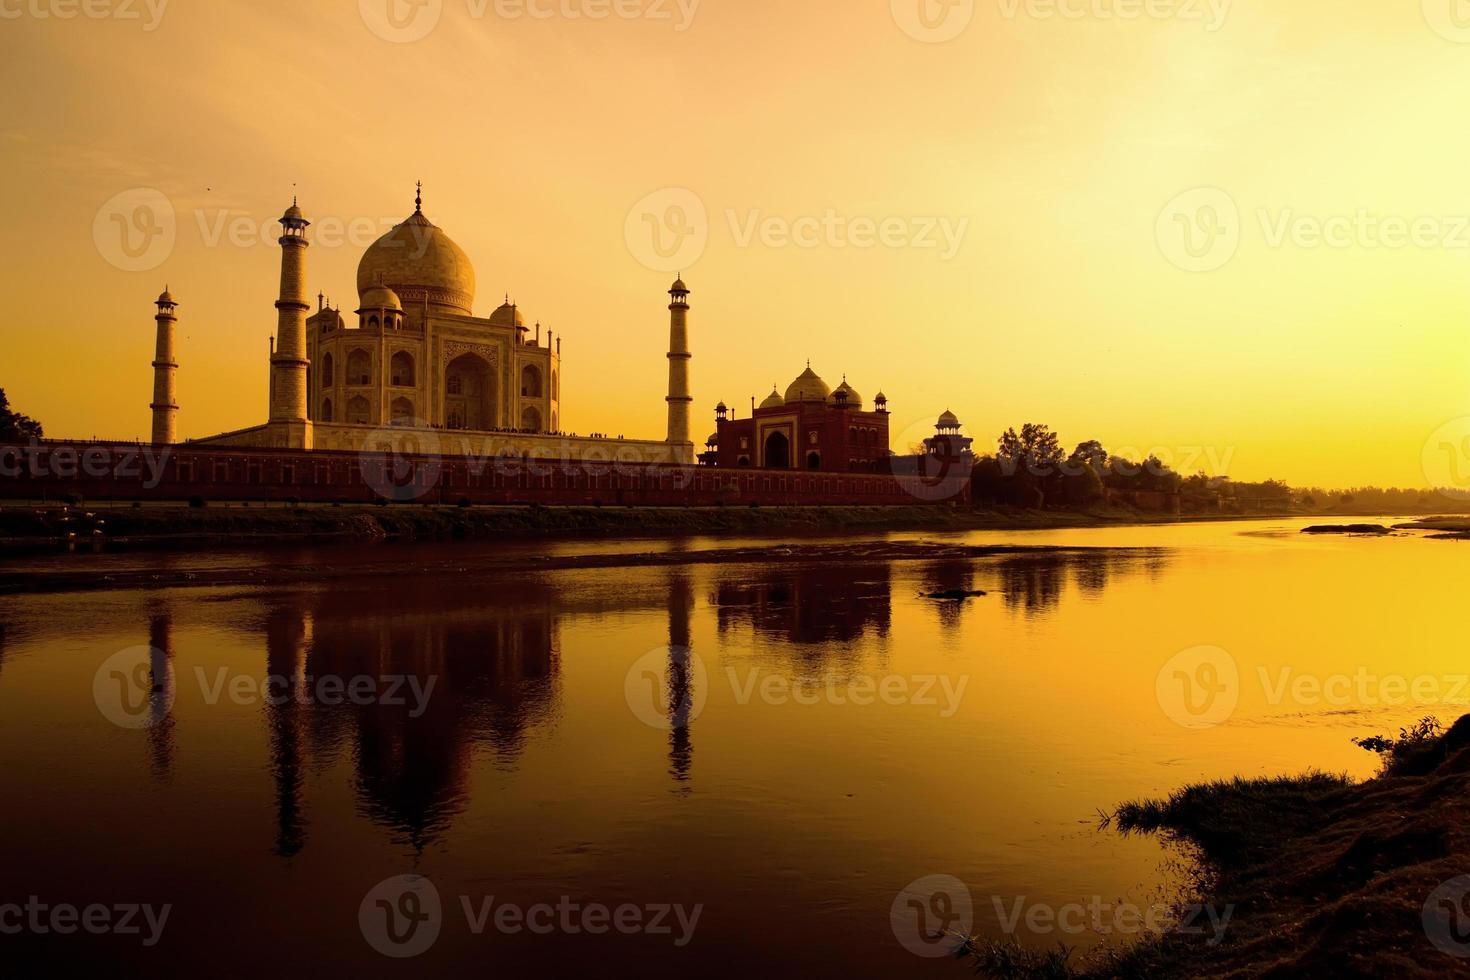 Taj Mahal at sunset refected in the Yamuna river. photo